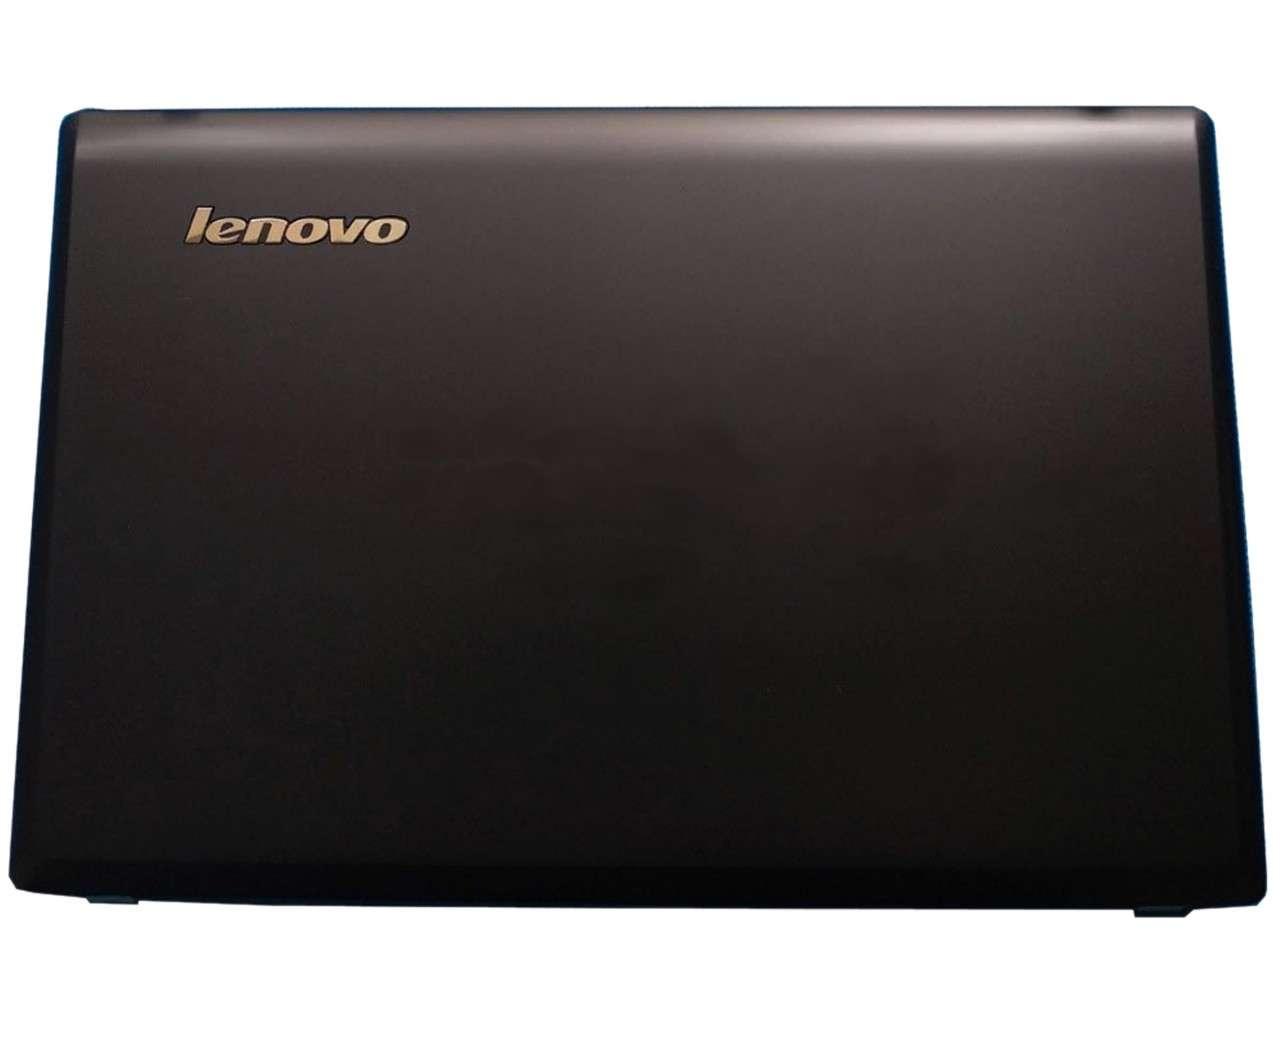 Capac Display BackCover Lenovo AP0N2000444 Carcasa Display Neagra Varianta 2 imagine powerlaptop.ro 2021